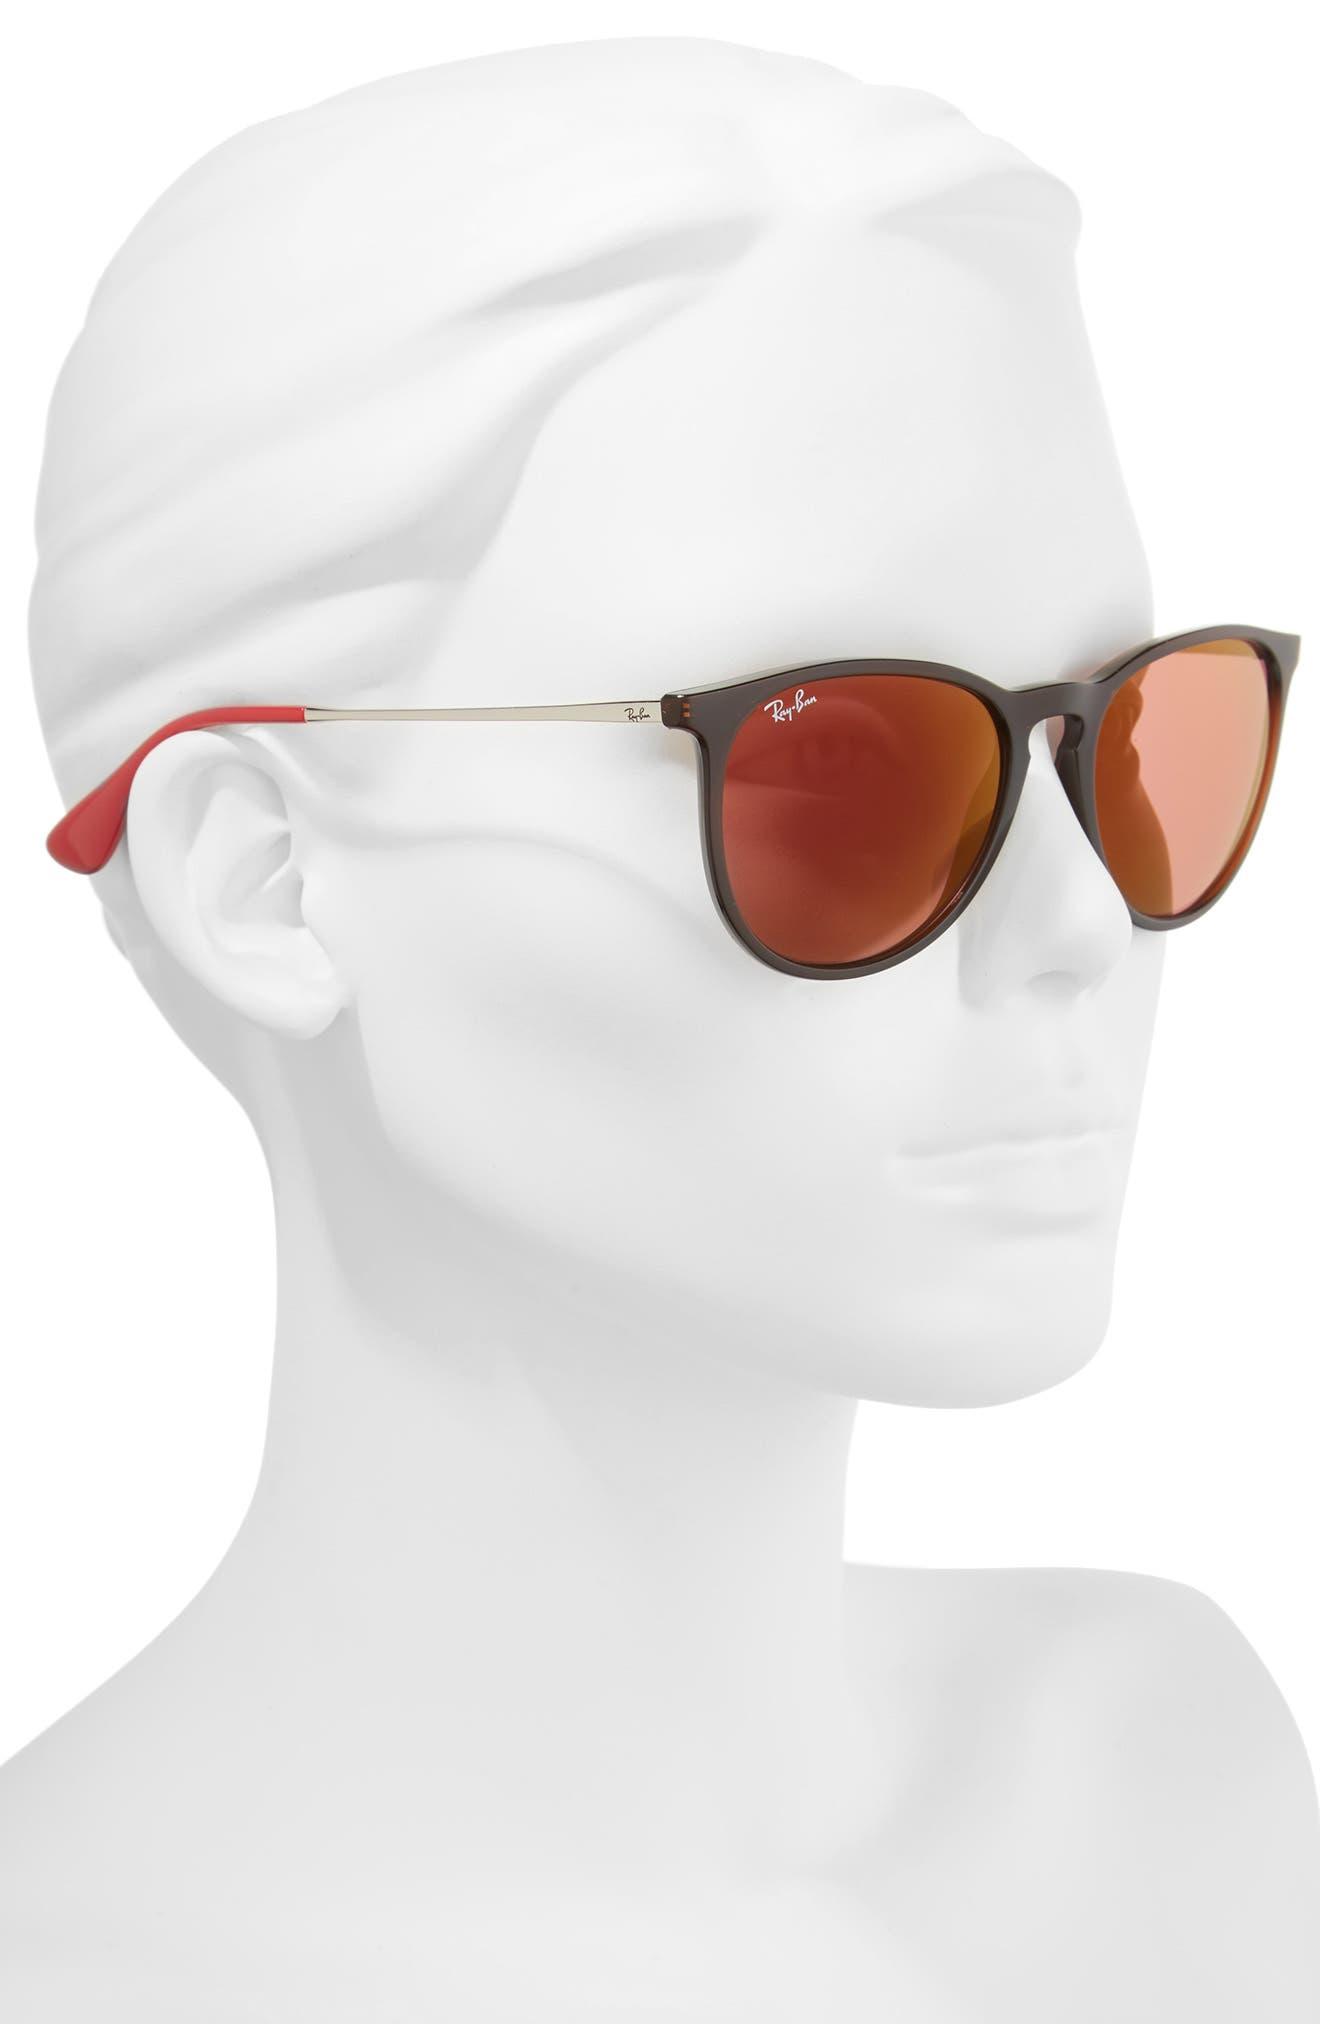 Erika Classic 54mm Sunglasses,                             Alternate thumbnail 3, color,                             Brown